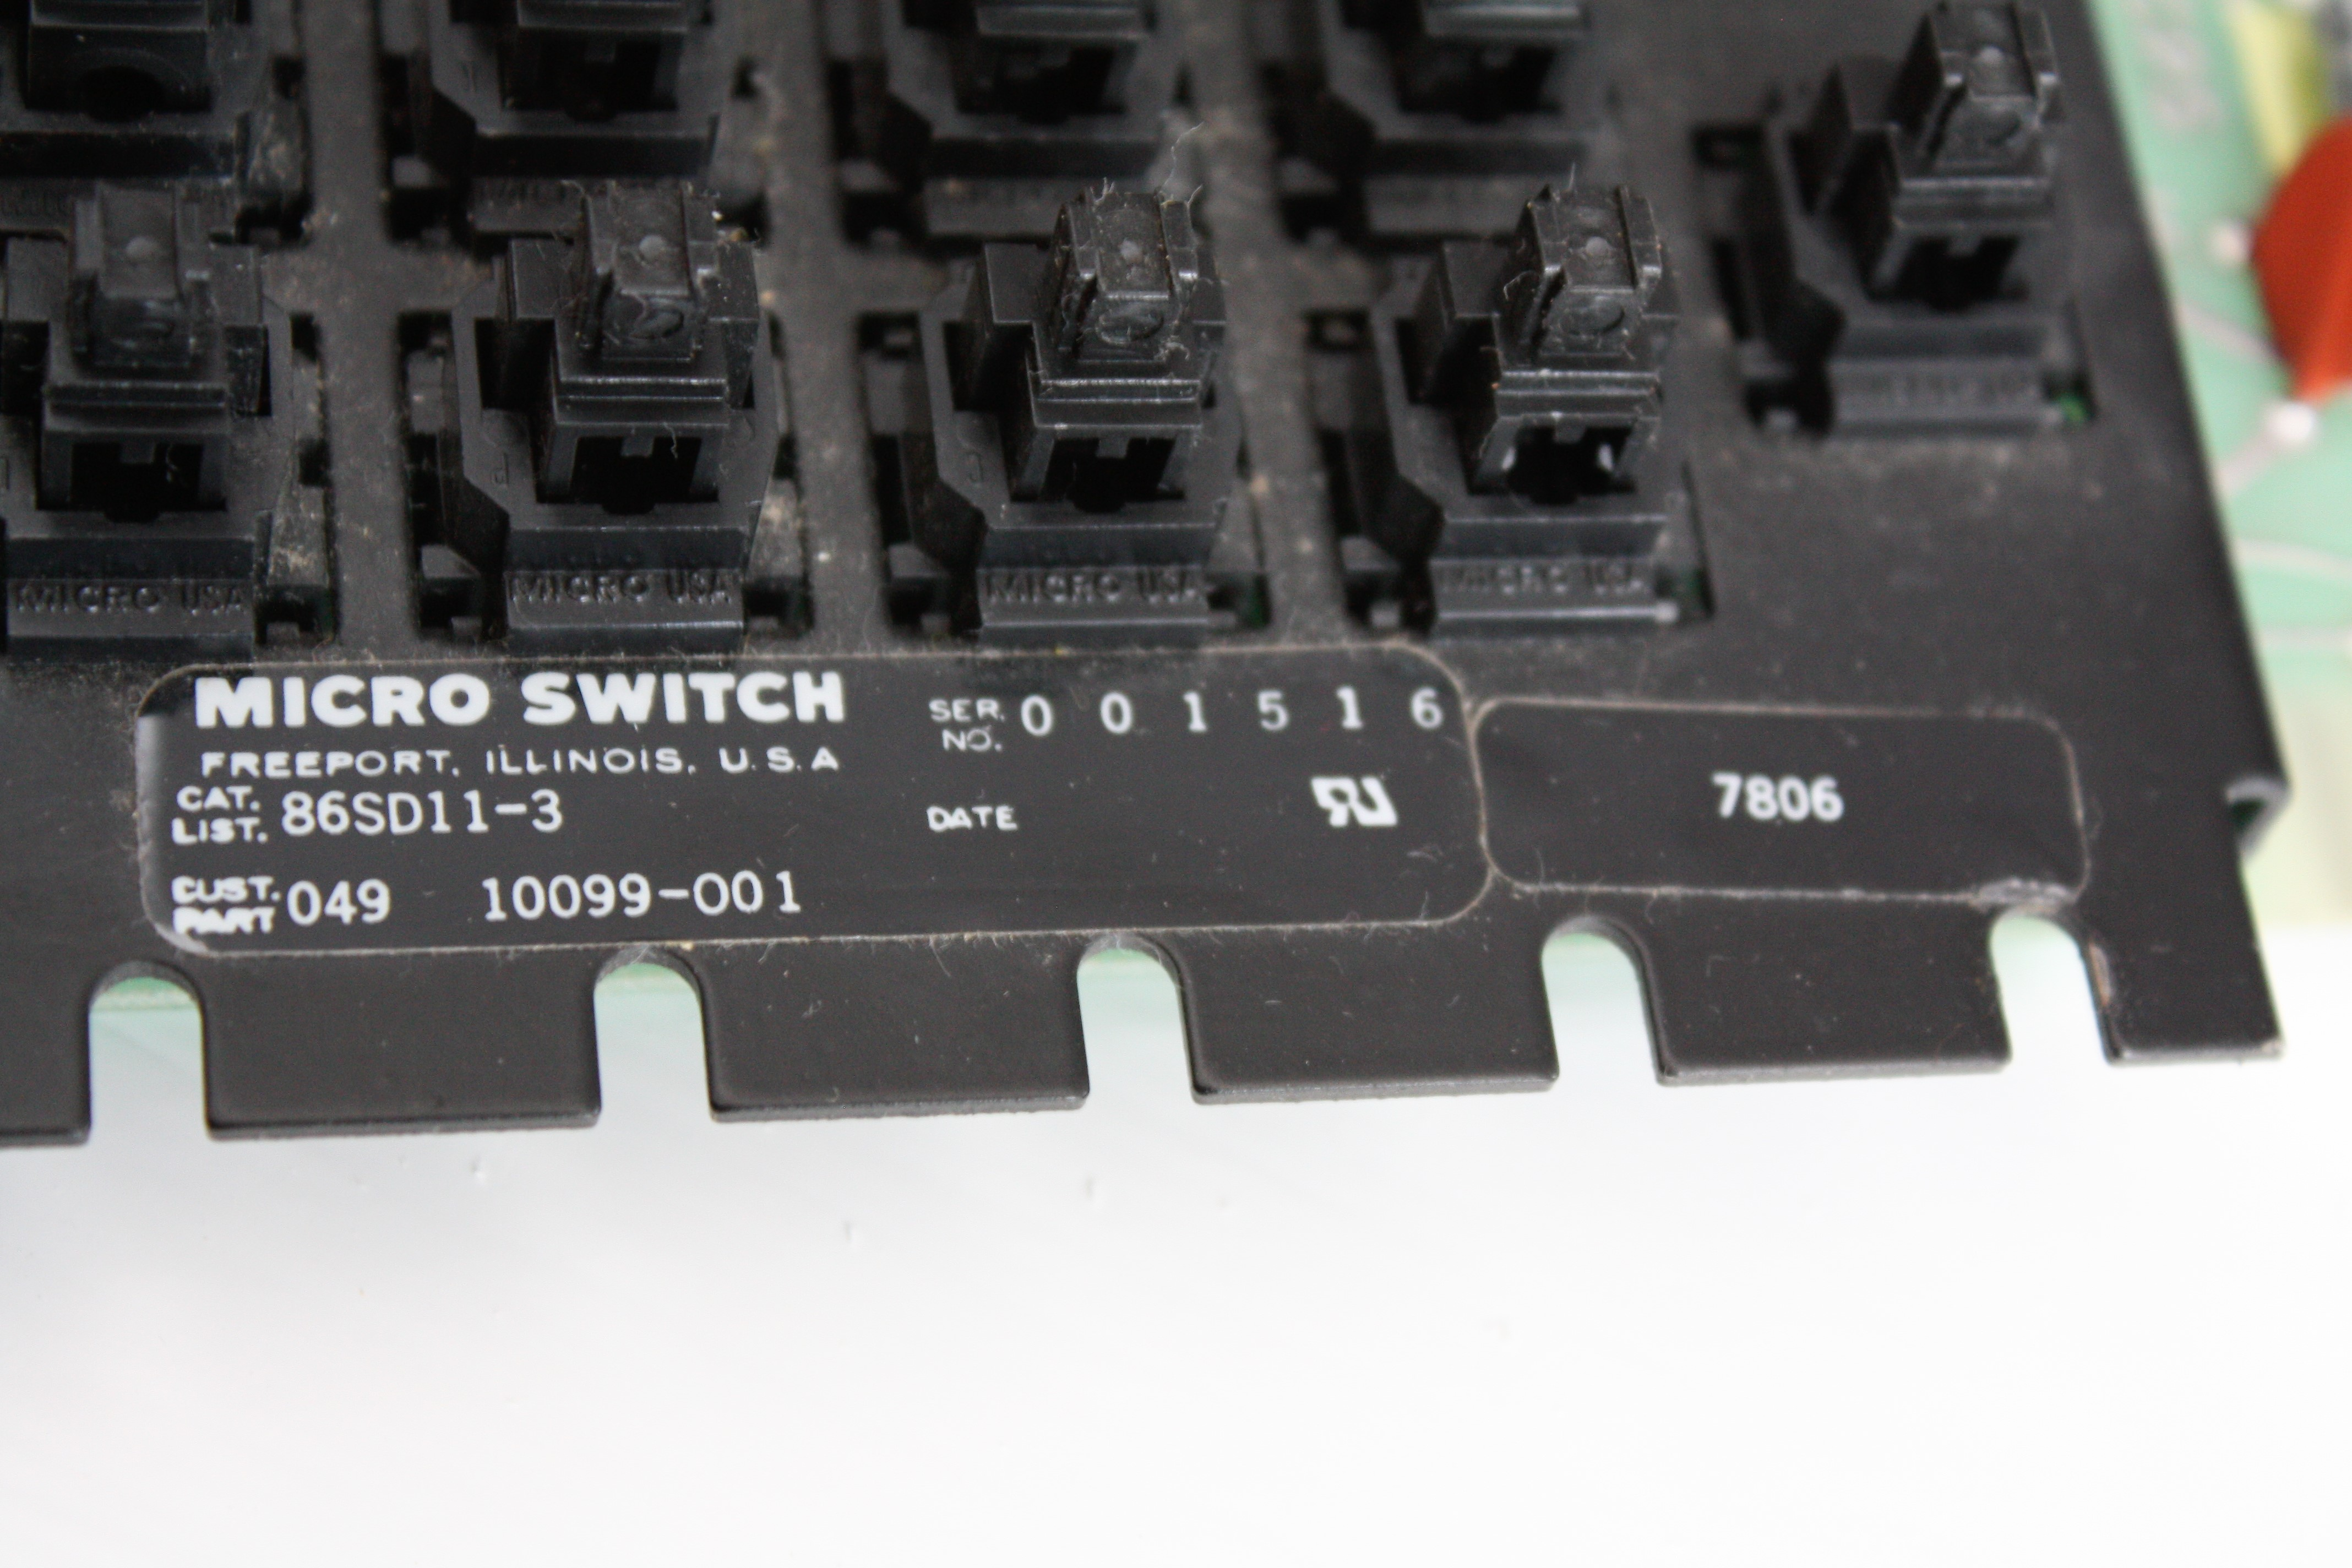 Honeywell Micro Switch Keyboard Microswitch Ti Mechanism Markings